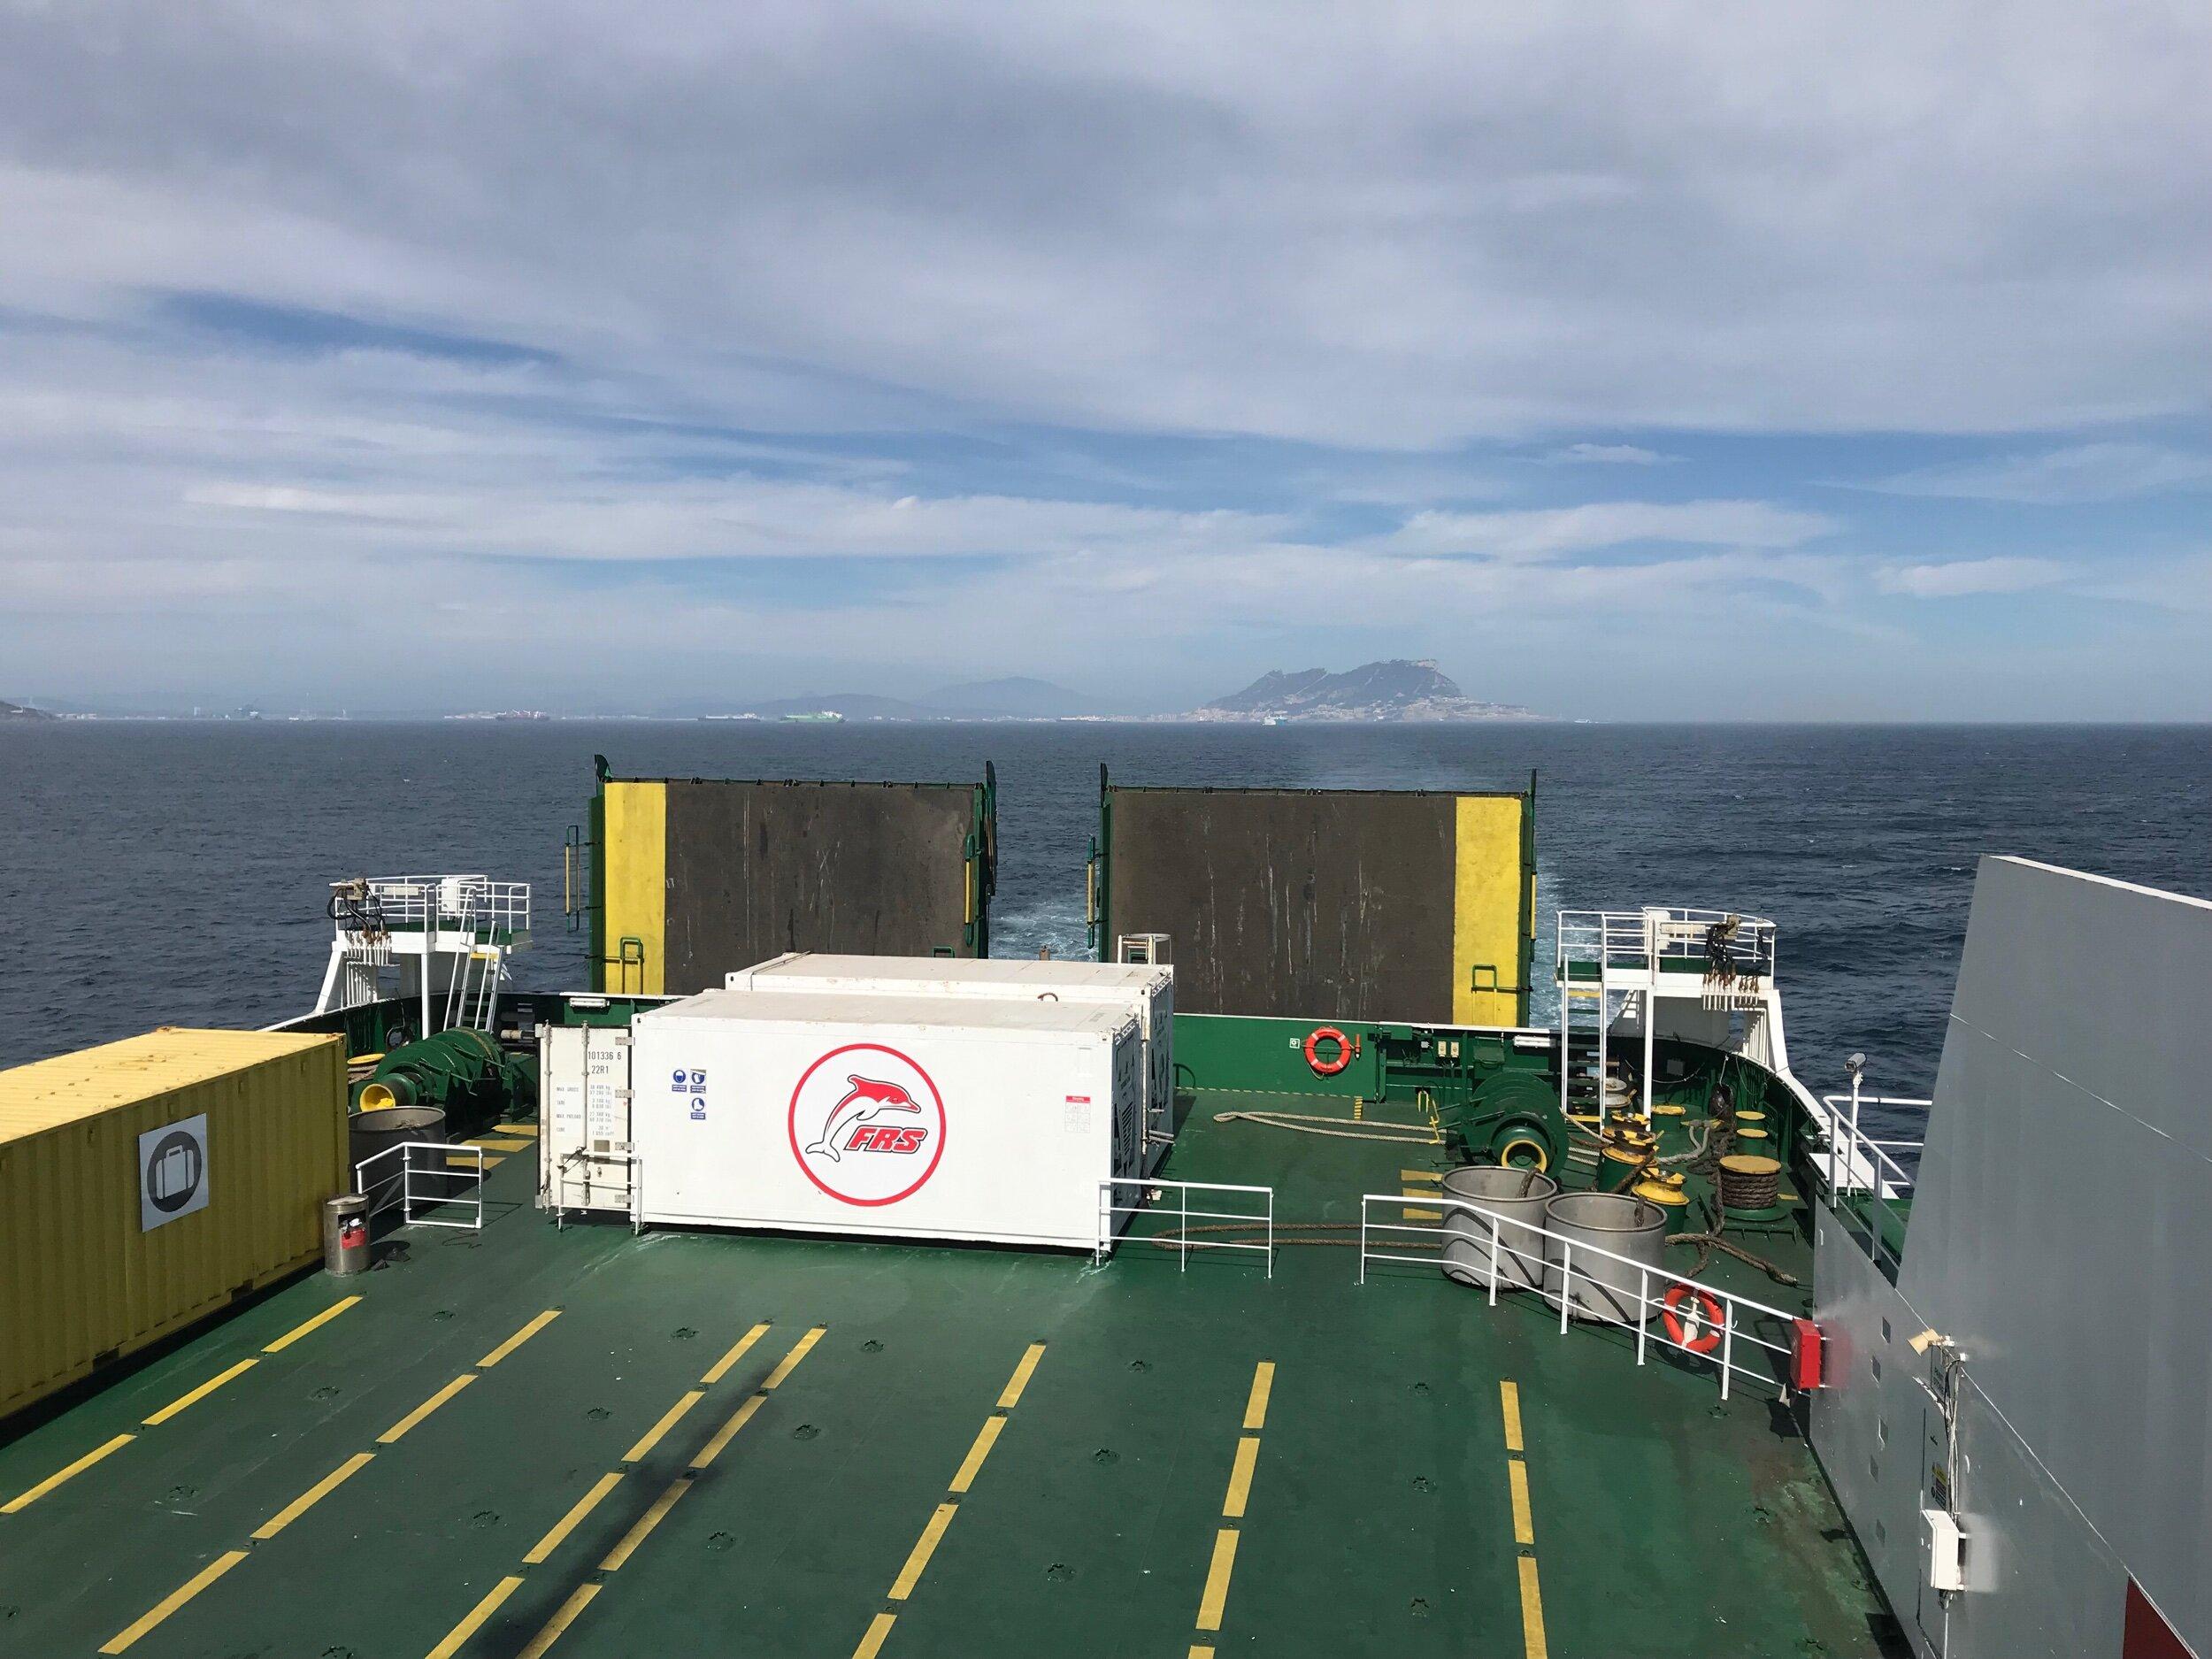 Leaving Spain, the Rock of Gibraltar